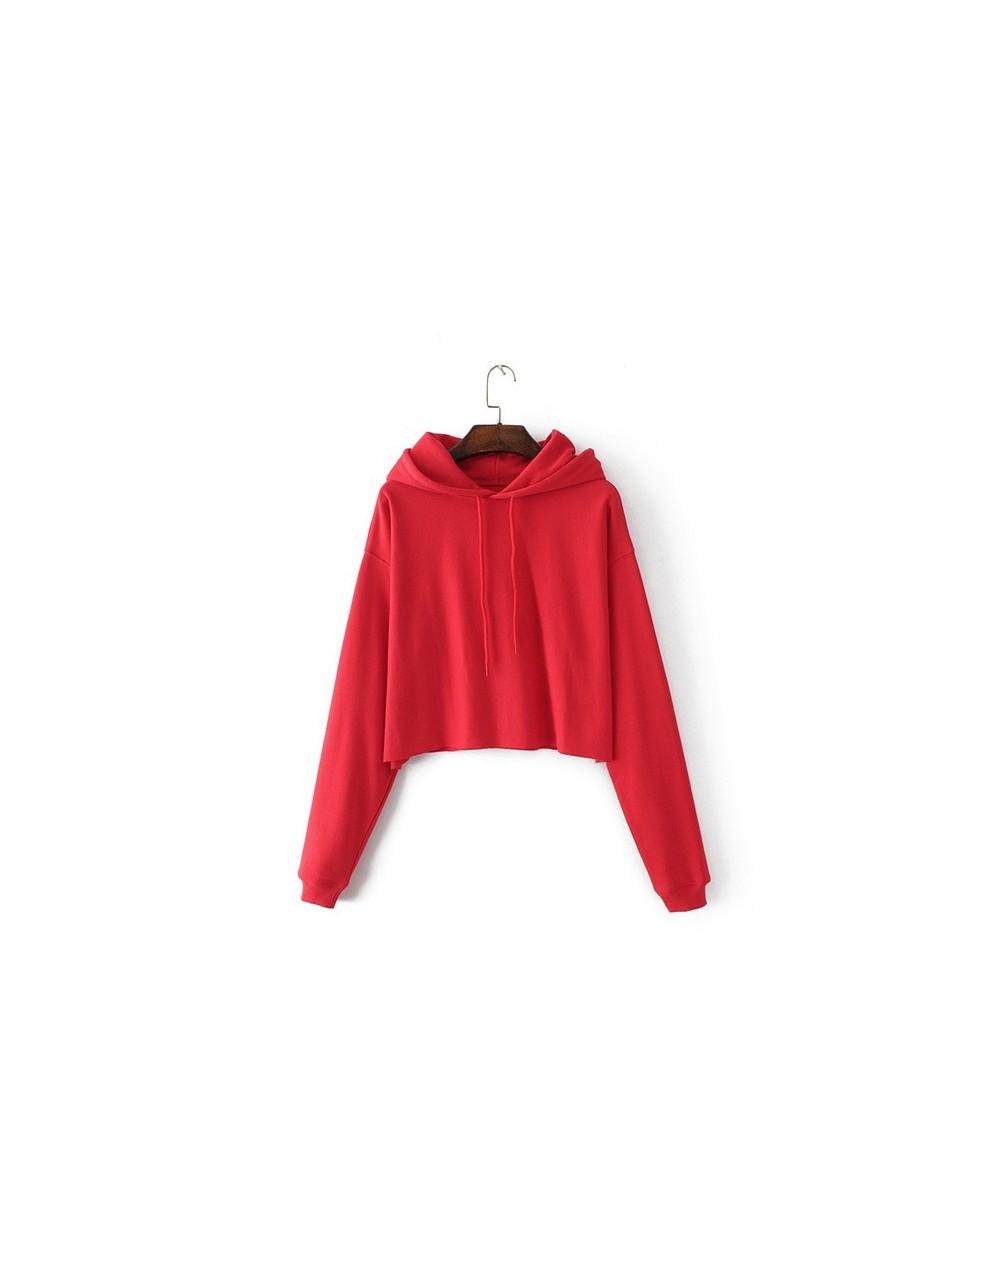 Basic Sweatshirt 2018 Spring Autumn New Hooded Long Sleeve Loose Hoodies Women Fashion Sporty Sweatshirts Pullovers - red - ...